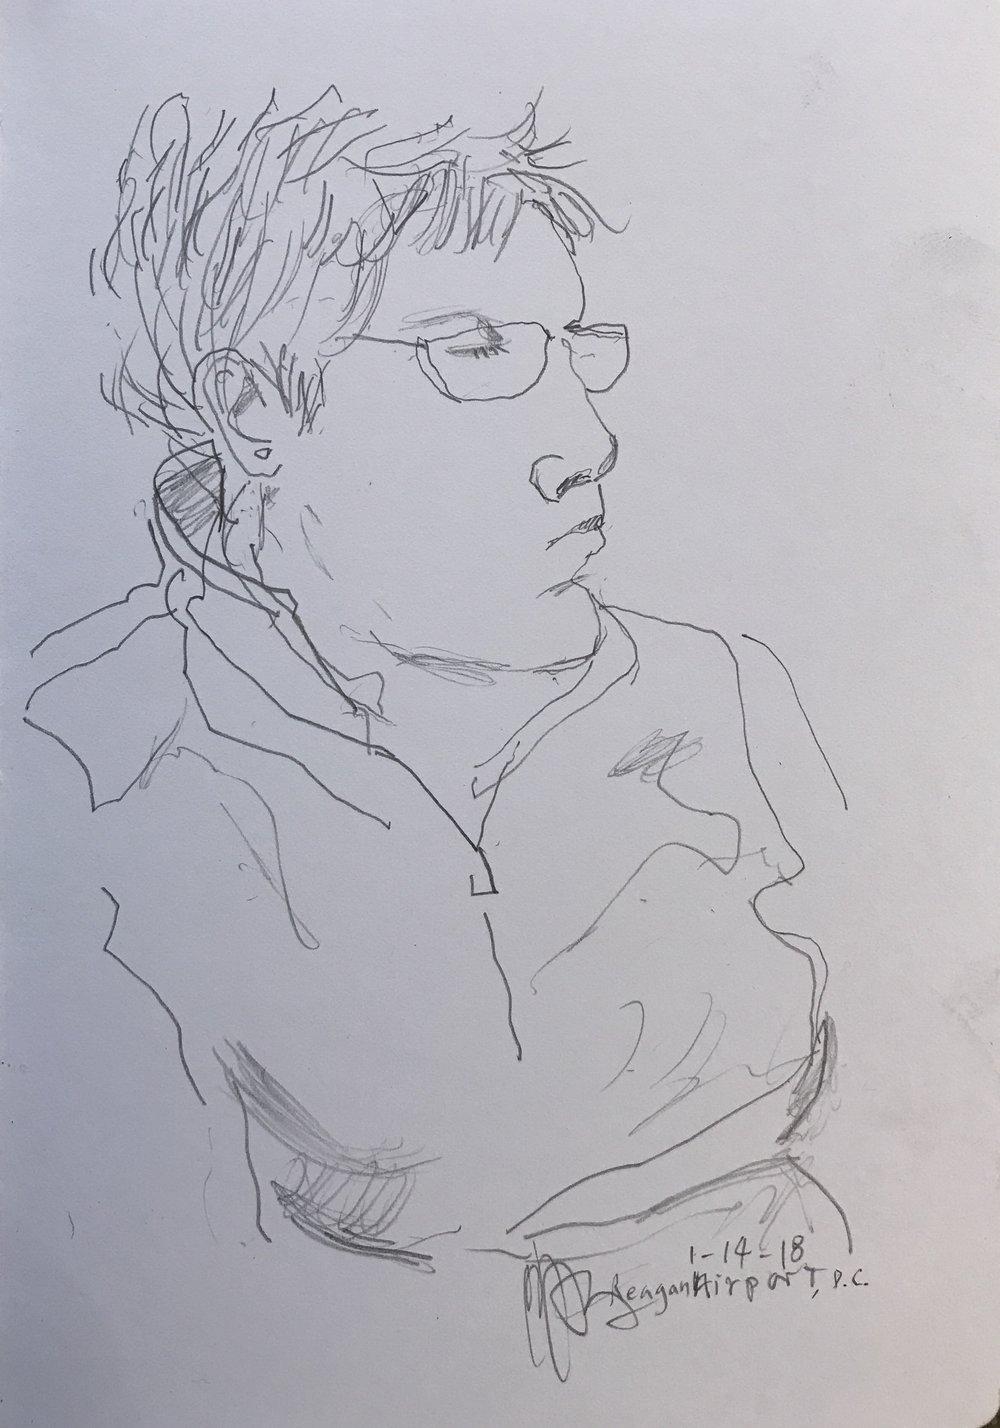 1-2018 NY-DC drawings 2.jpg